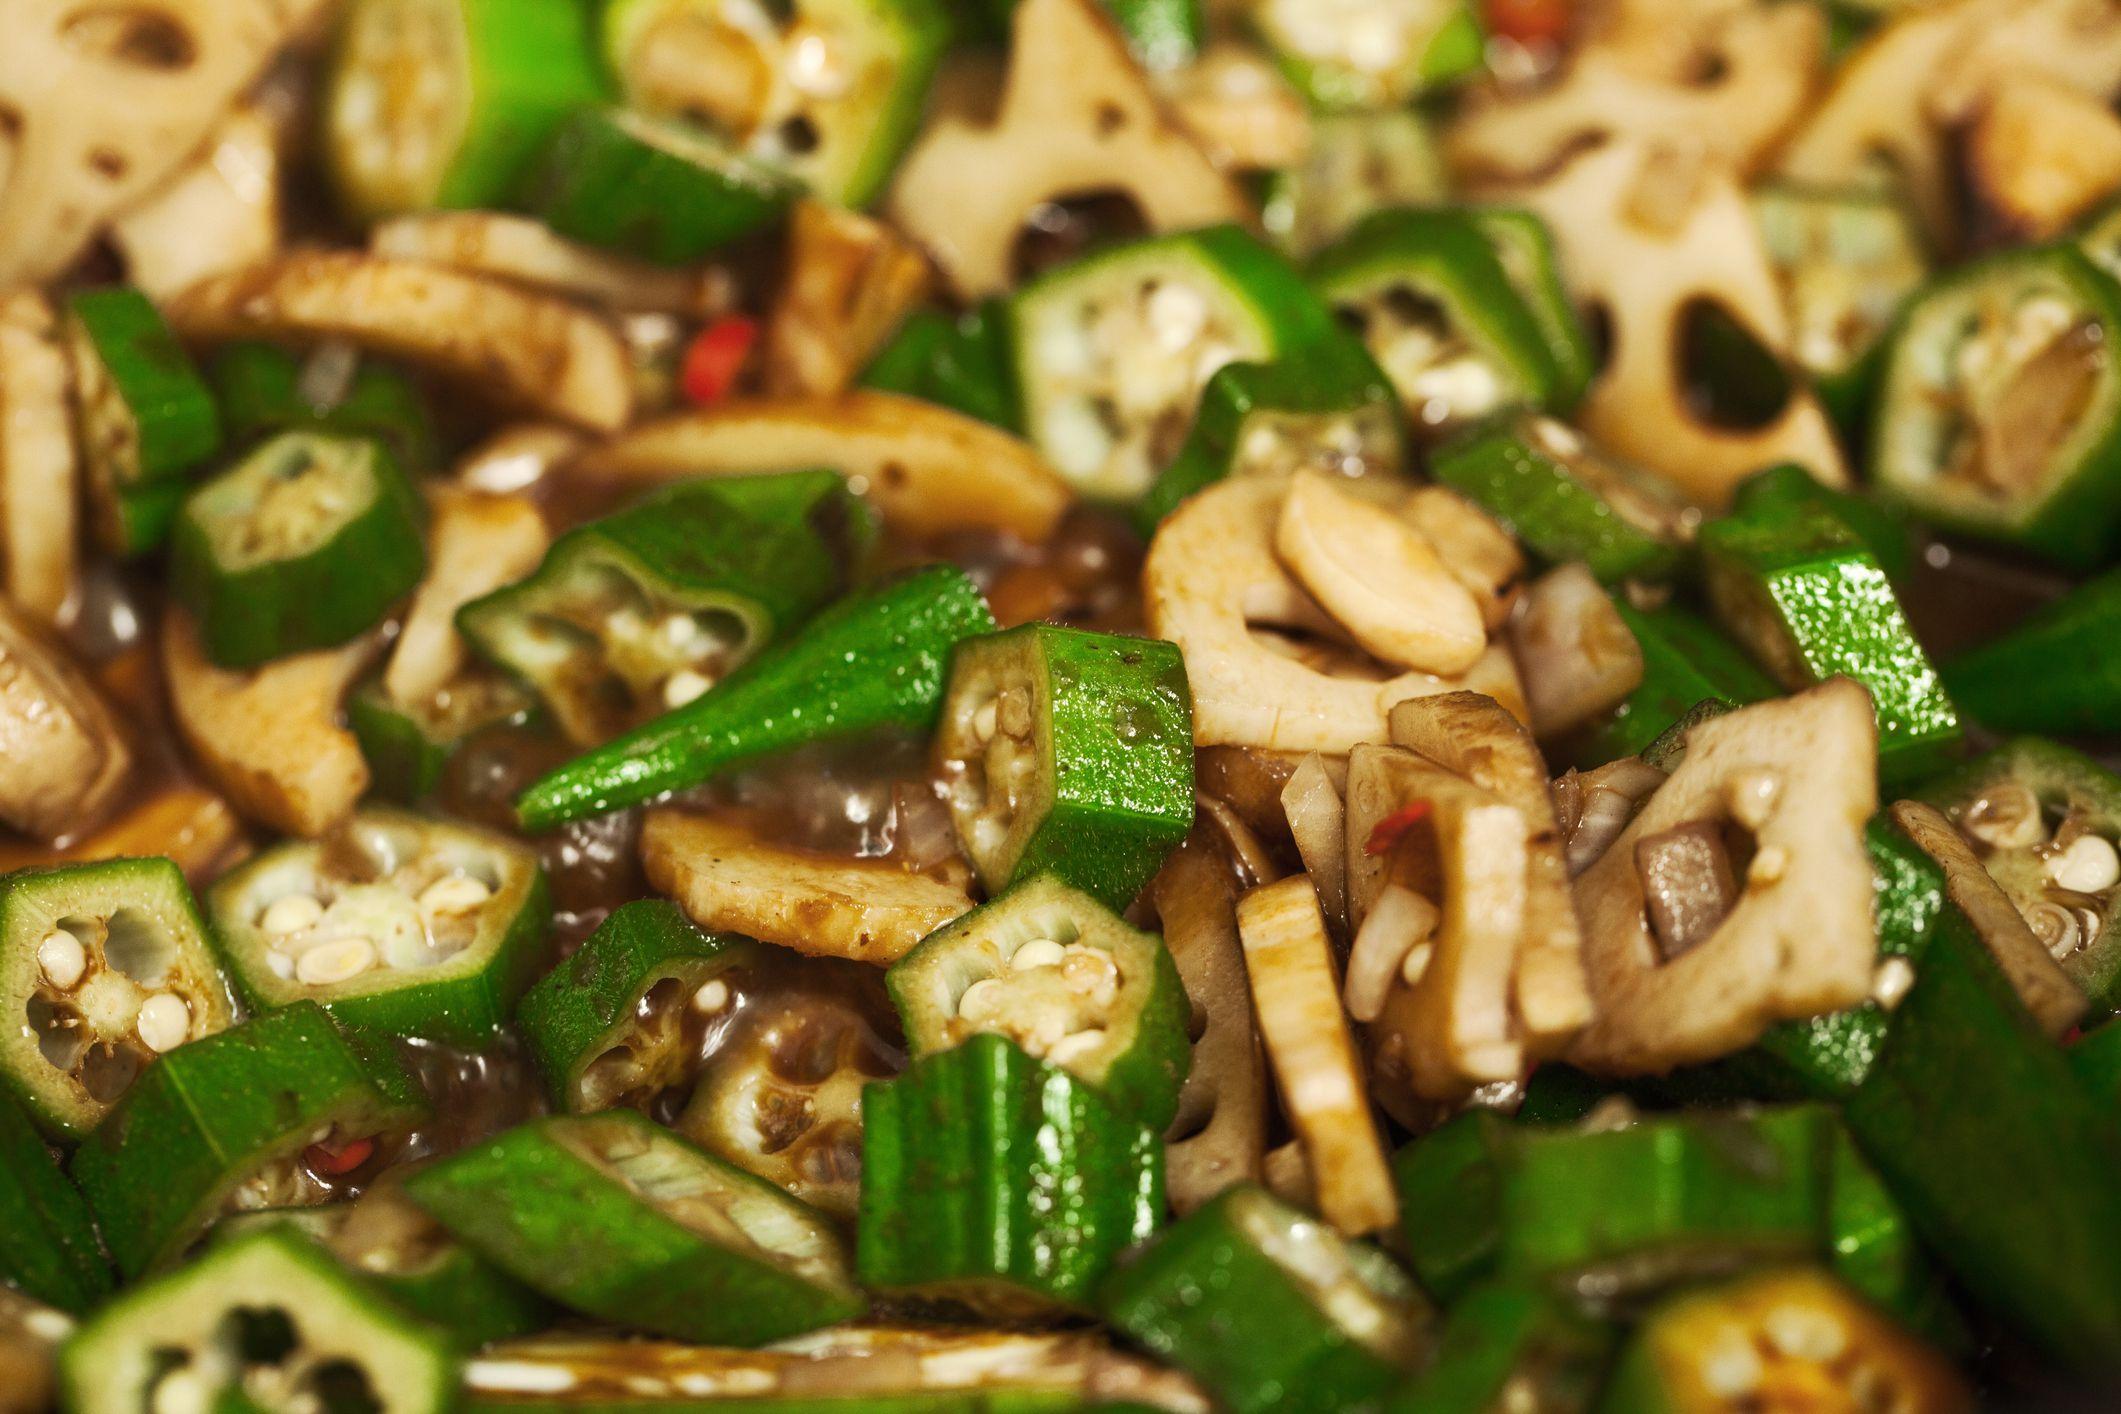 How to Make Indian Stir-Fried Chinese Okra (Turai Ki Sabzi)